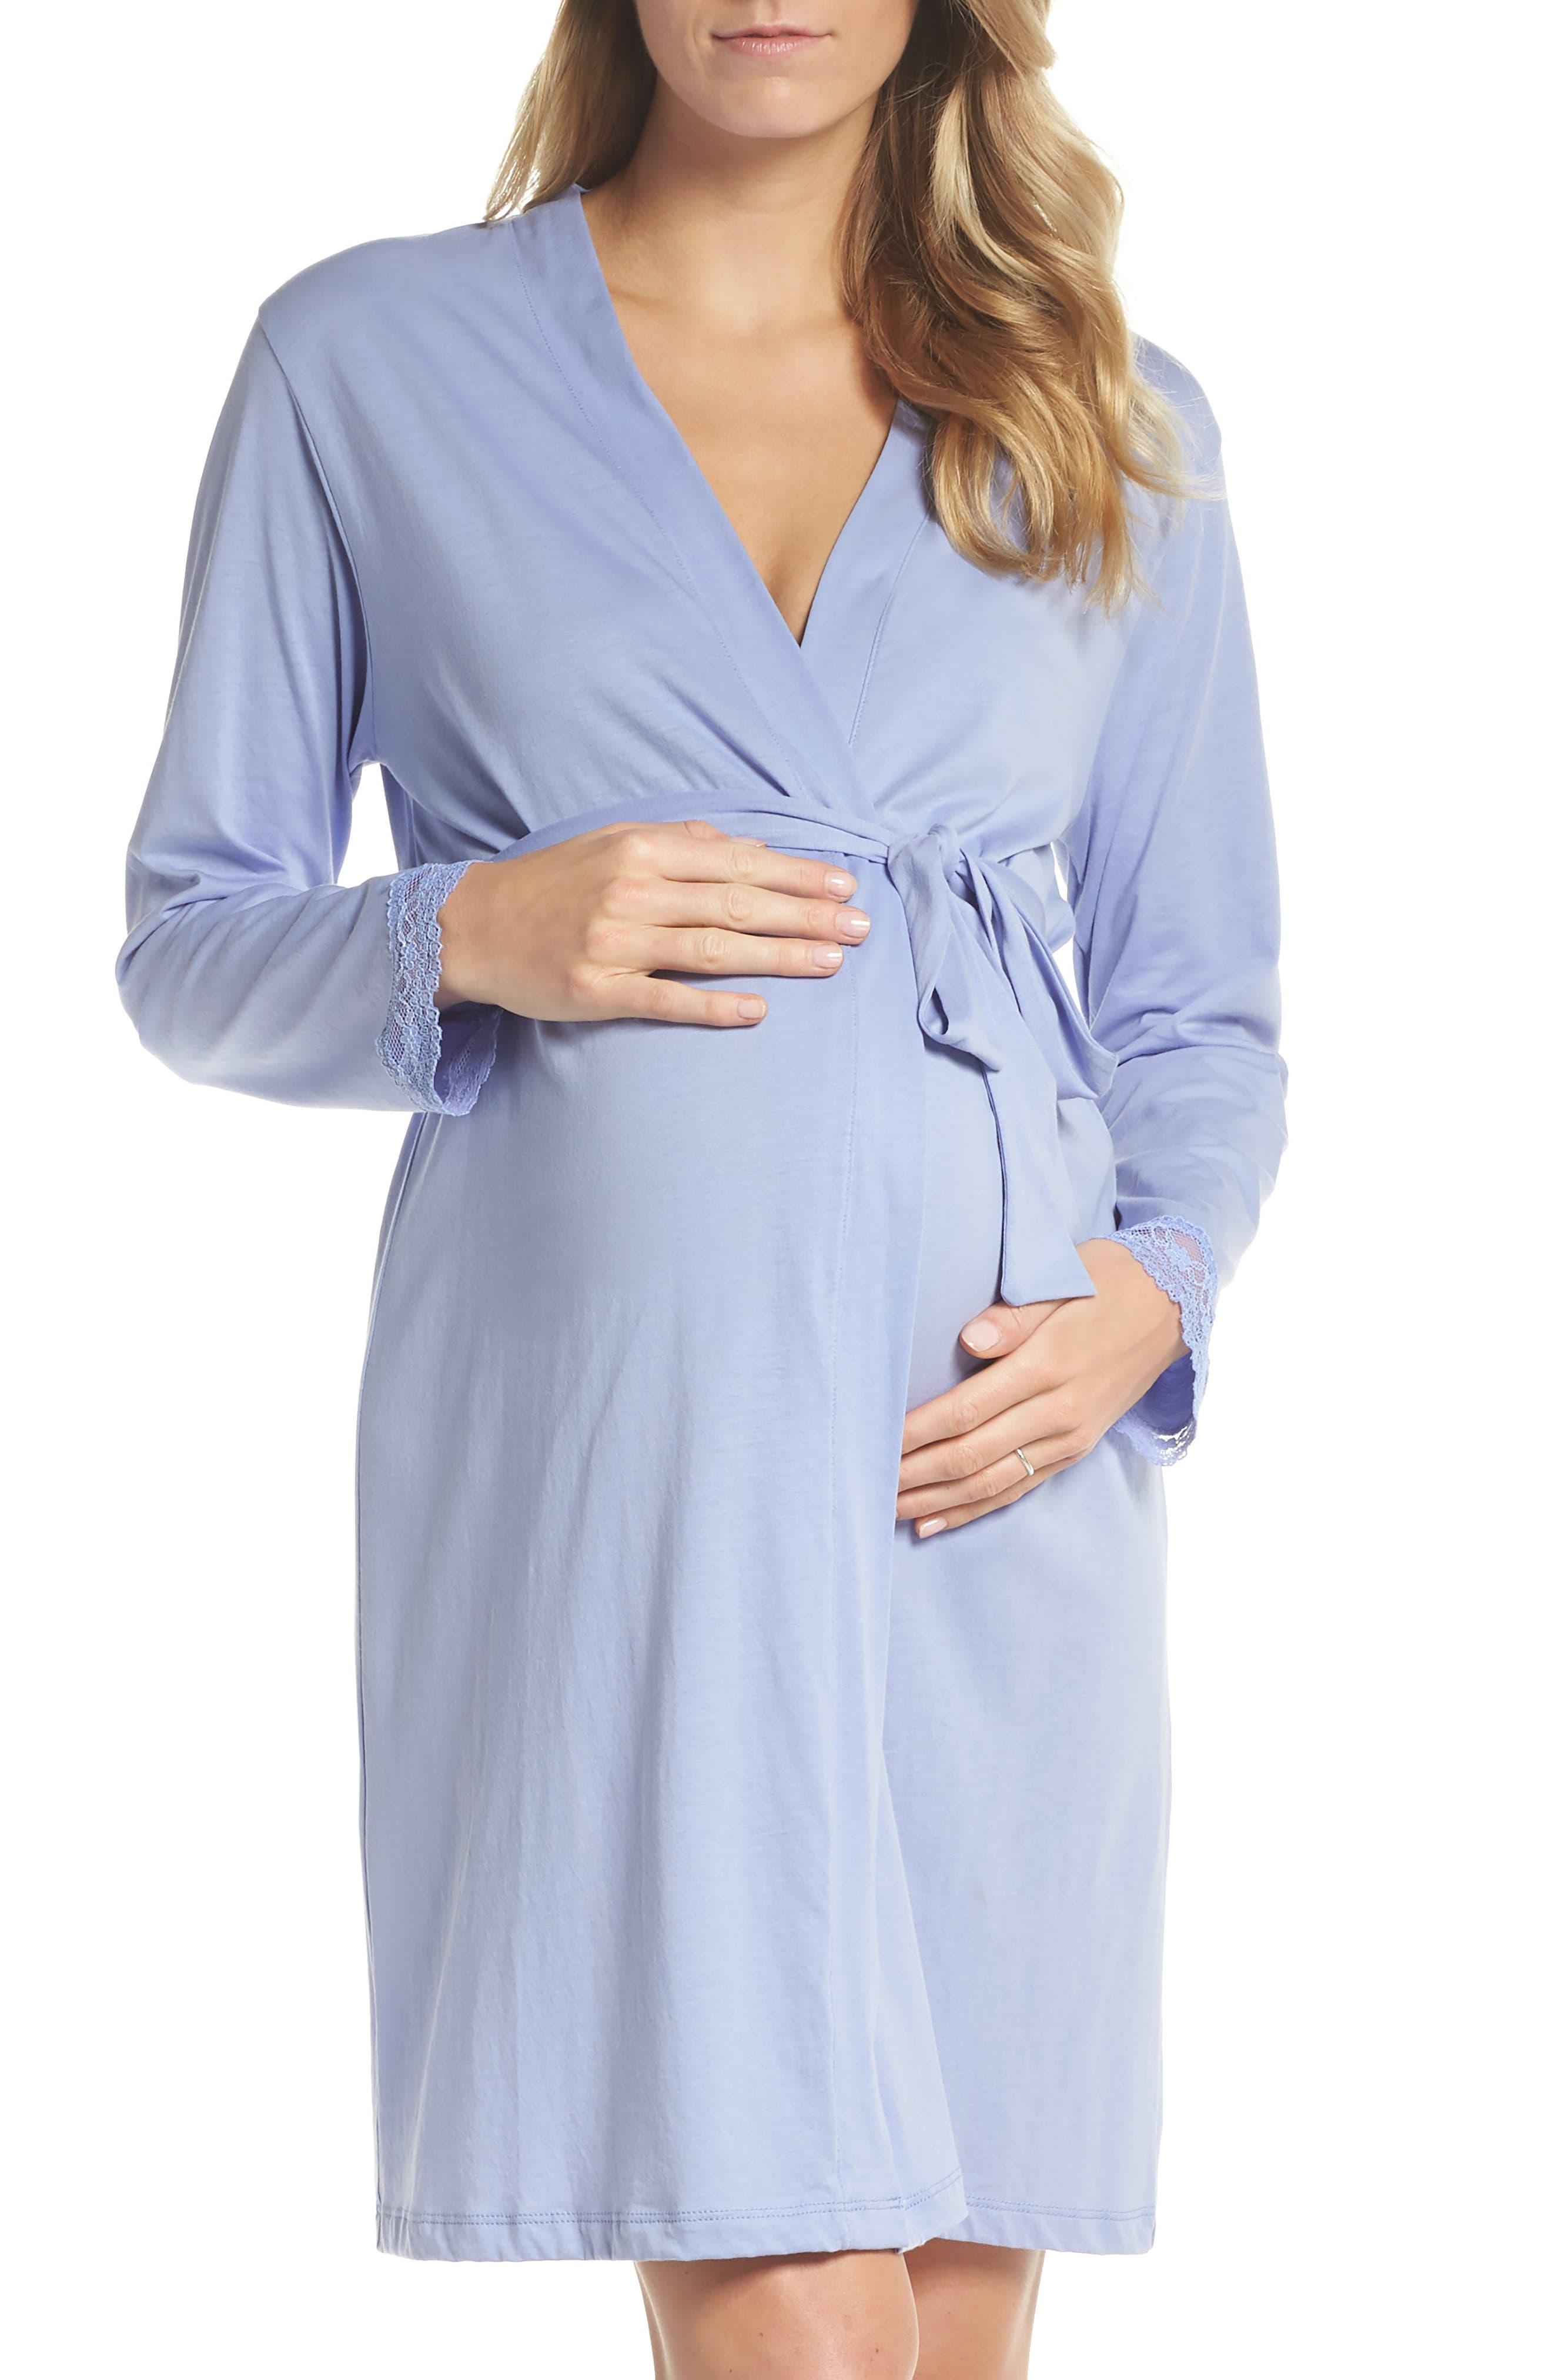 Violette Maternity/Nursing Robe,                             Main thumbnail 1, color,                             PURPLE